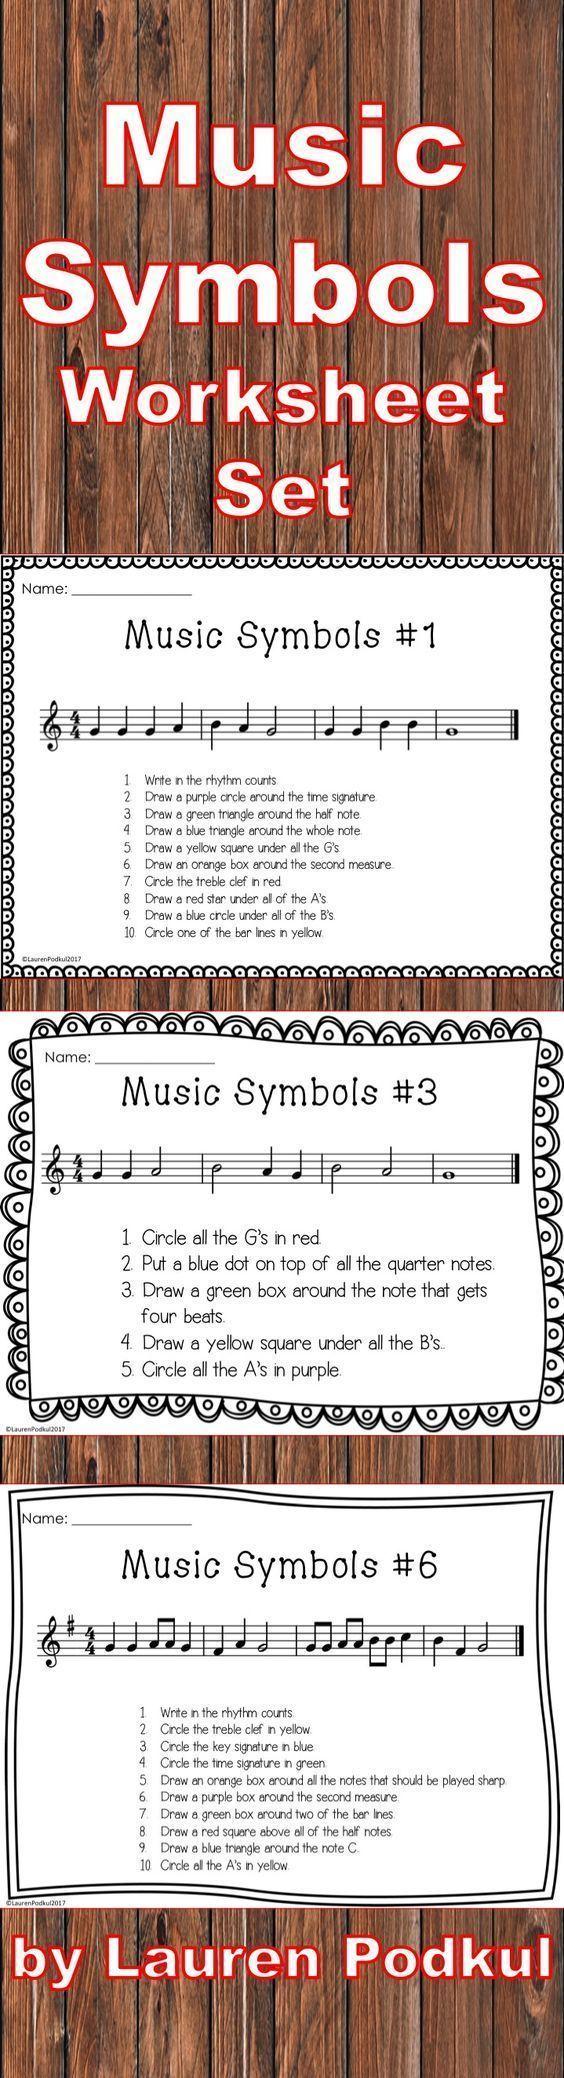 Music Symbols Worksheet Beginner Music Humanities Lesson Elements Of